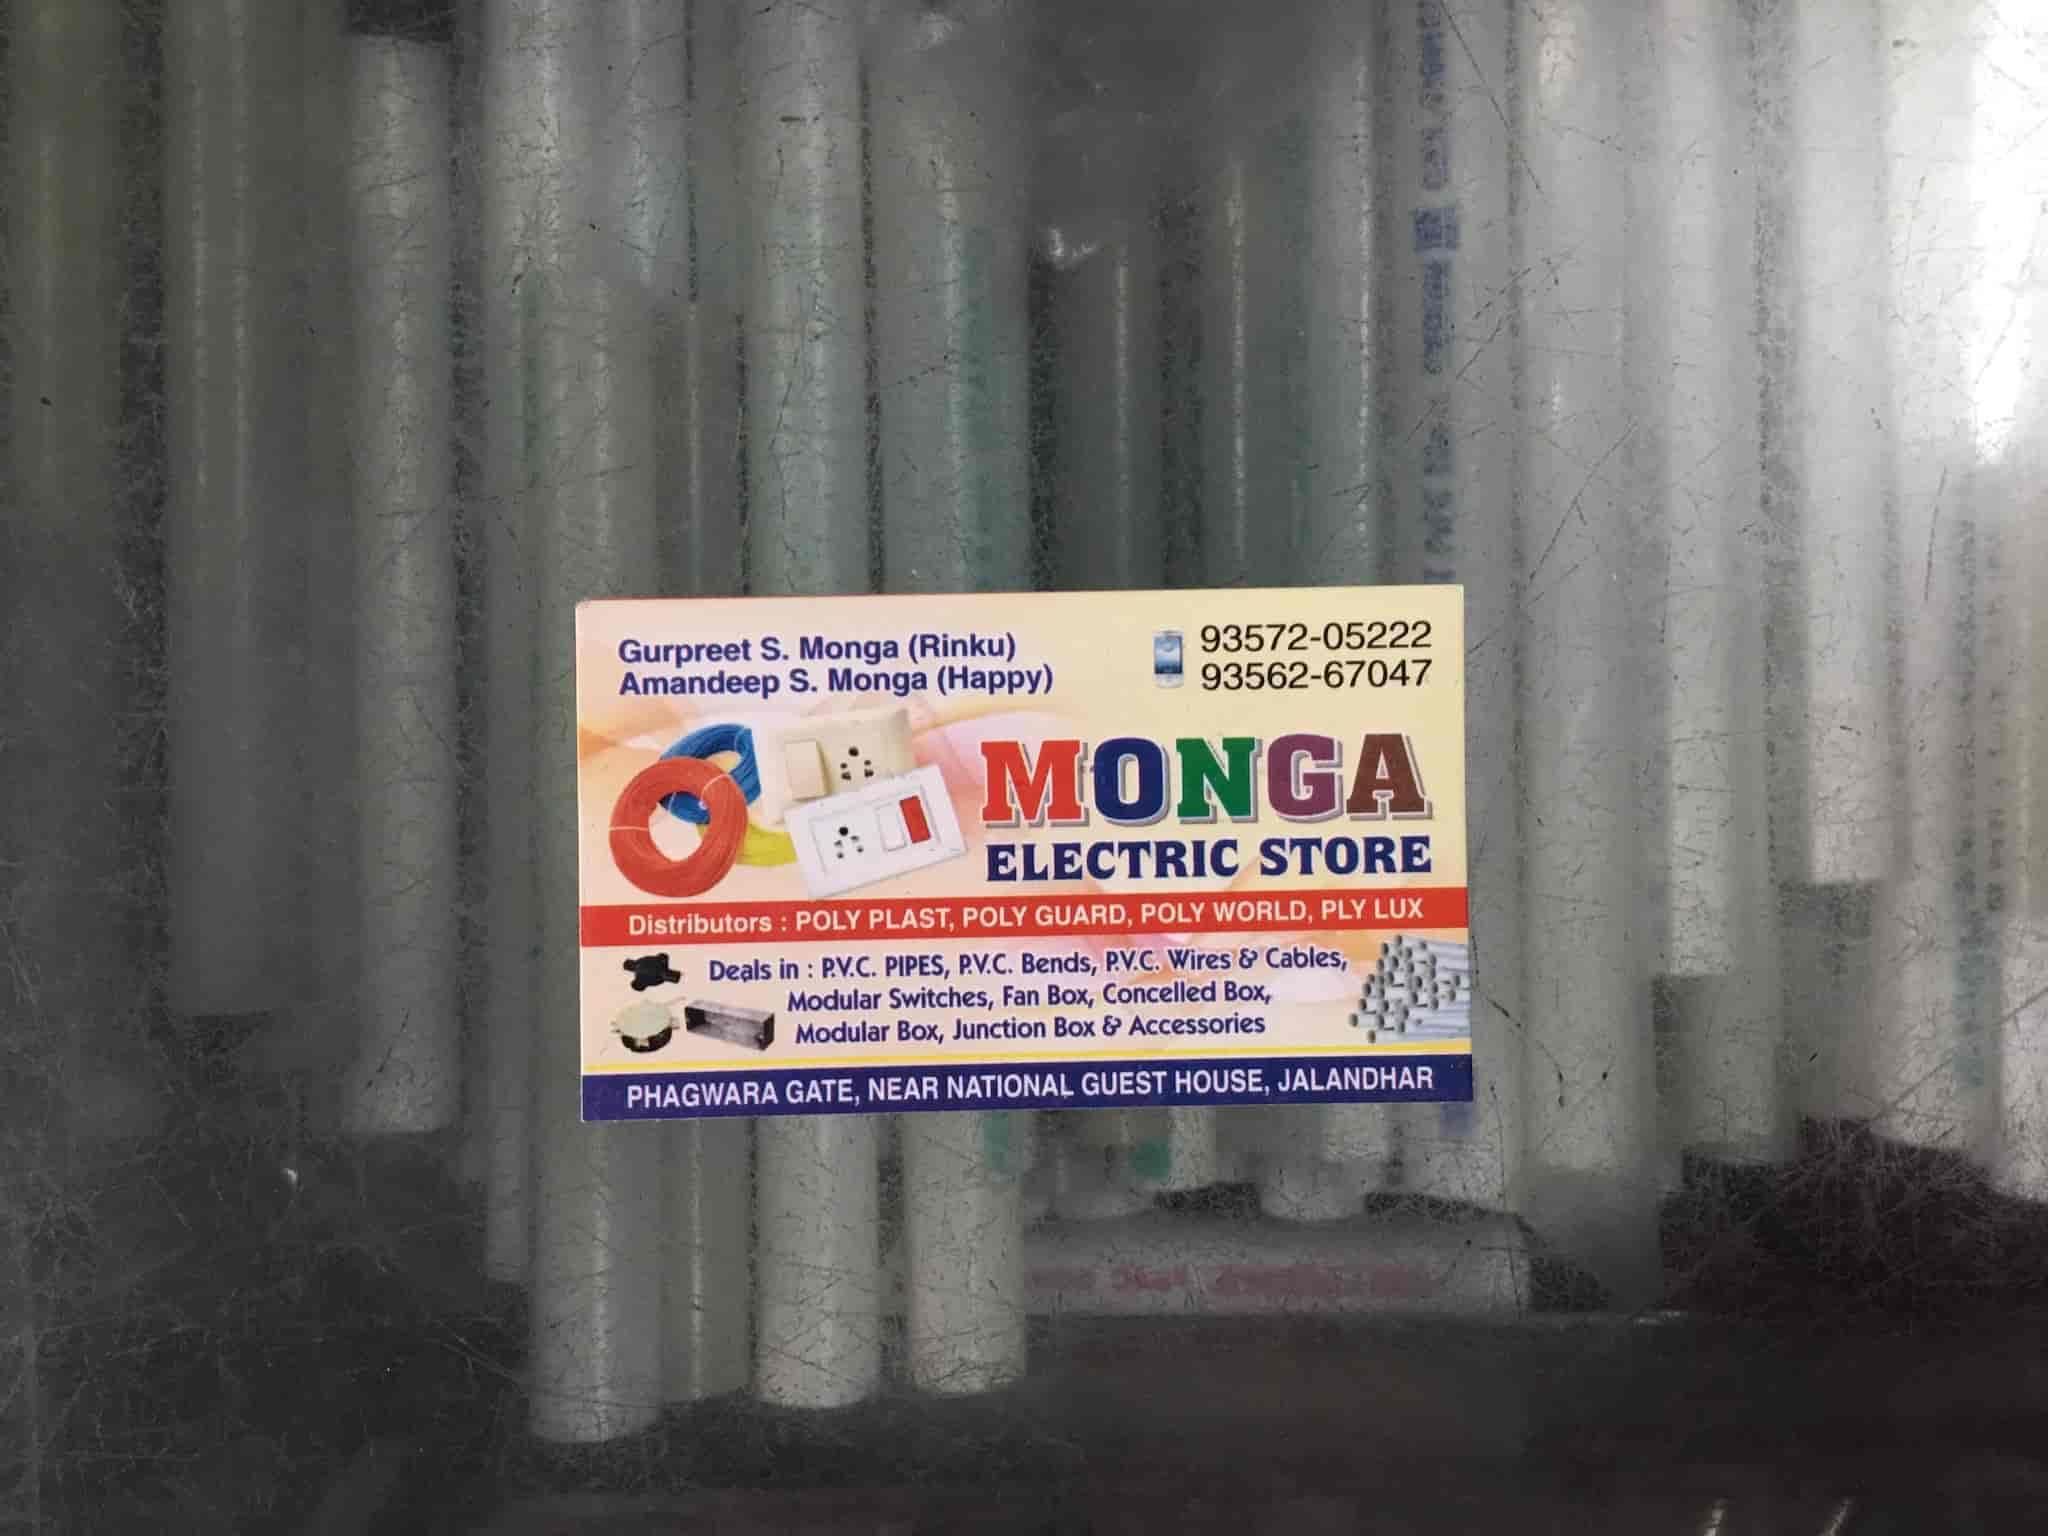 Monga Electric Store, Phagwara - Electricity Supply in Jalandhar ...